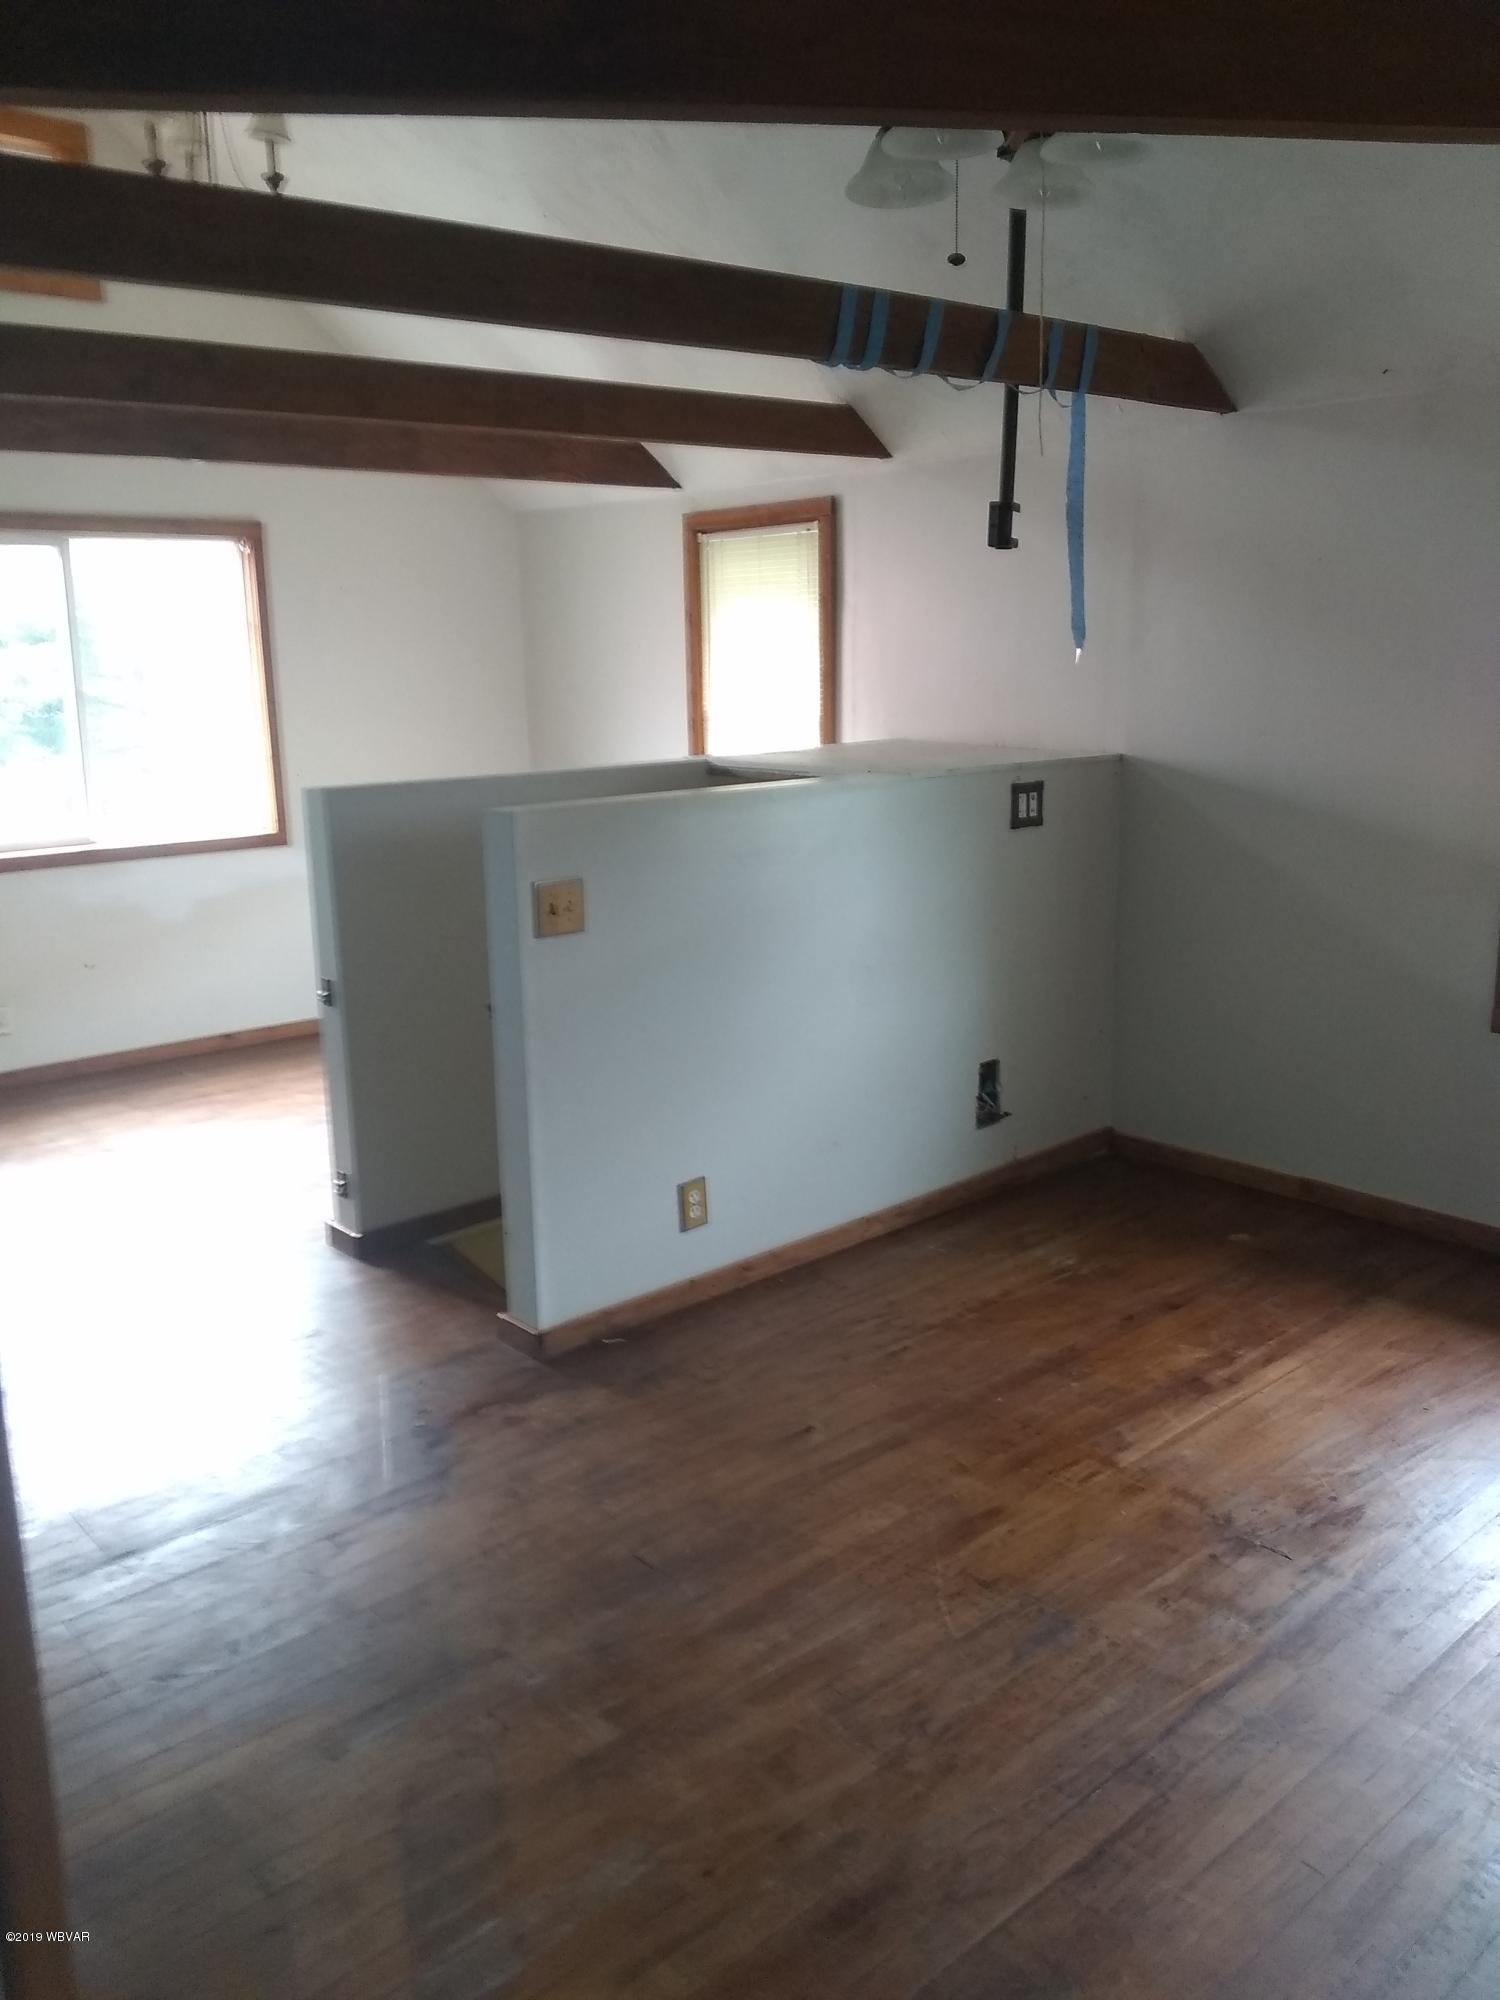 215 GRANT STREET,Lock Haven,PA 17745,2 Bedrooms Bedrooms,2 BathroomsBathrooms,Residential,GRANT,WB-88235